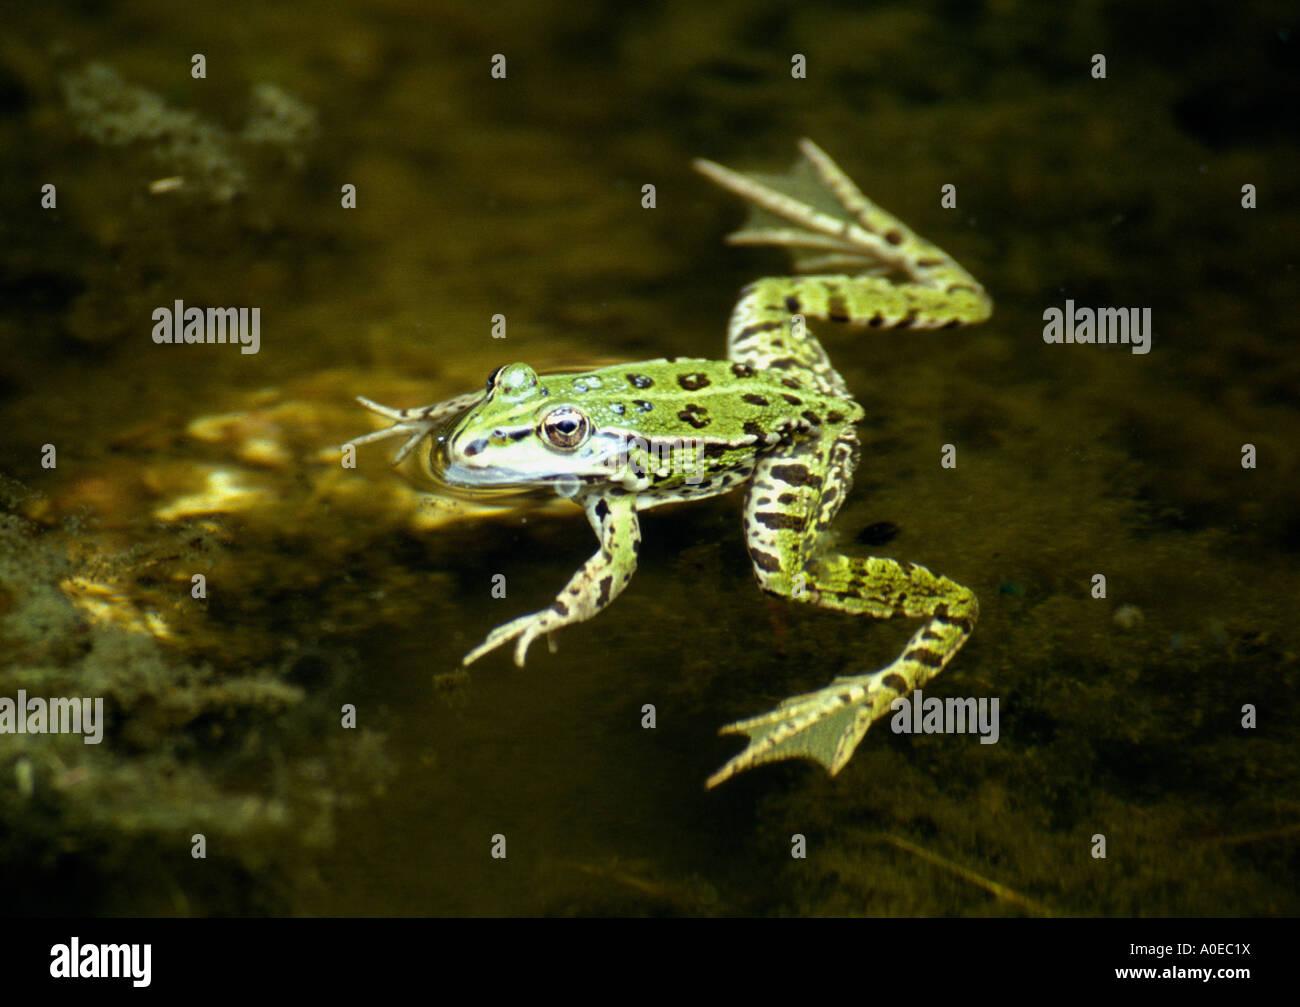 pool-frog-rana-lessonae-A0EC1X.jpg